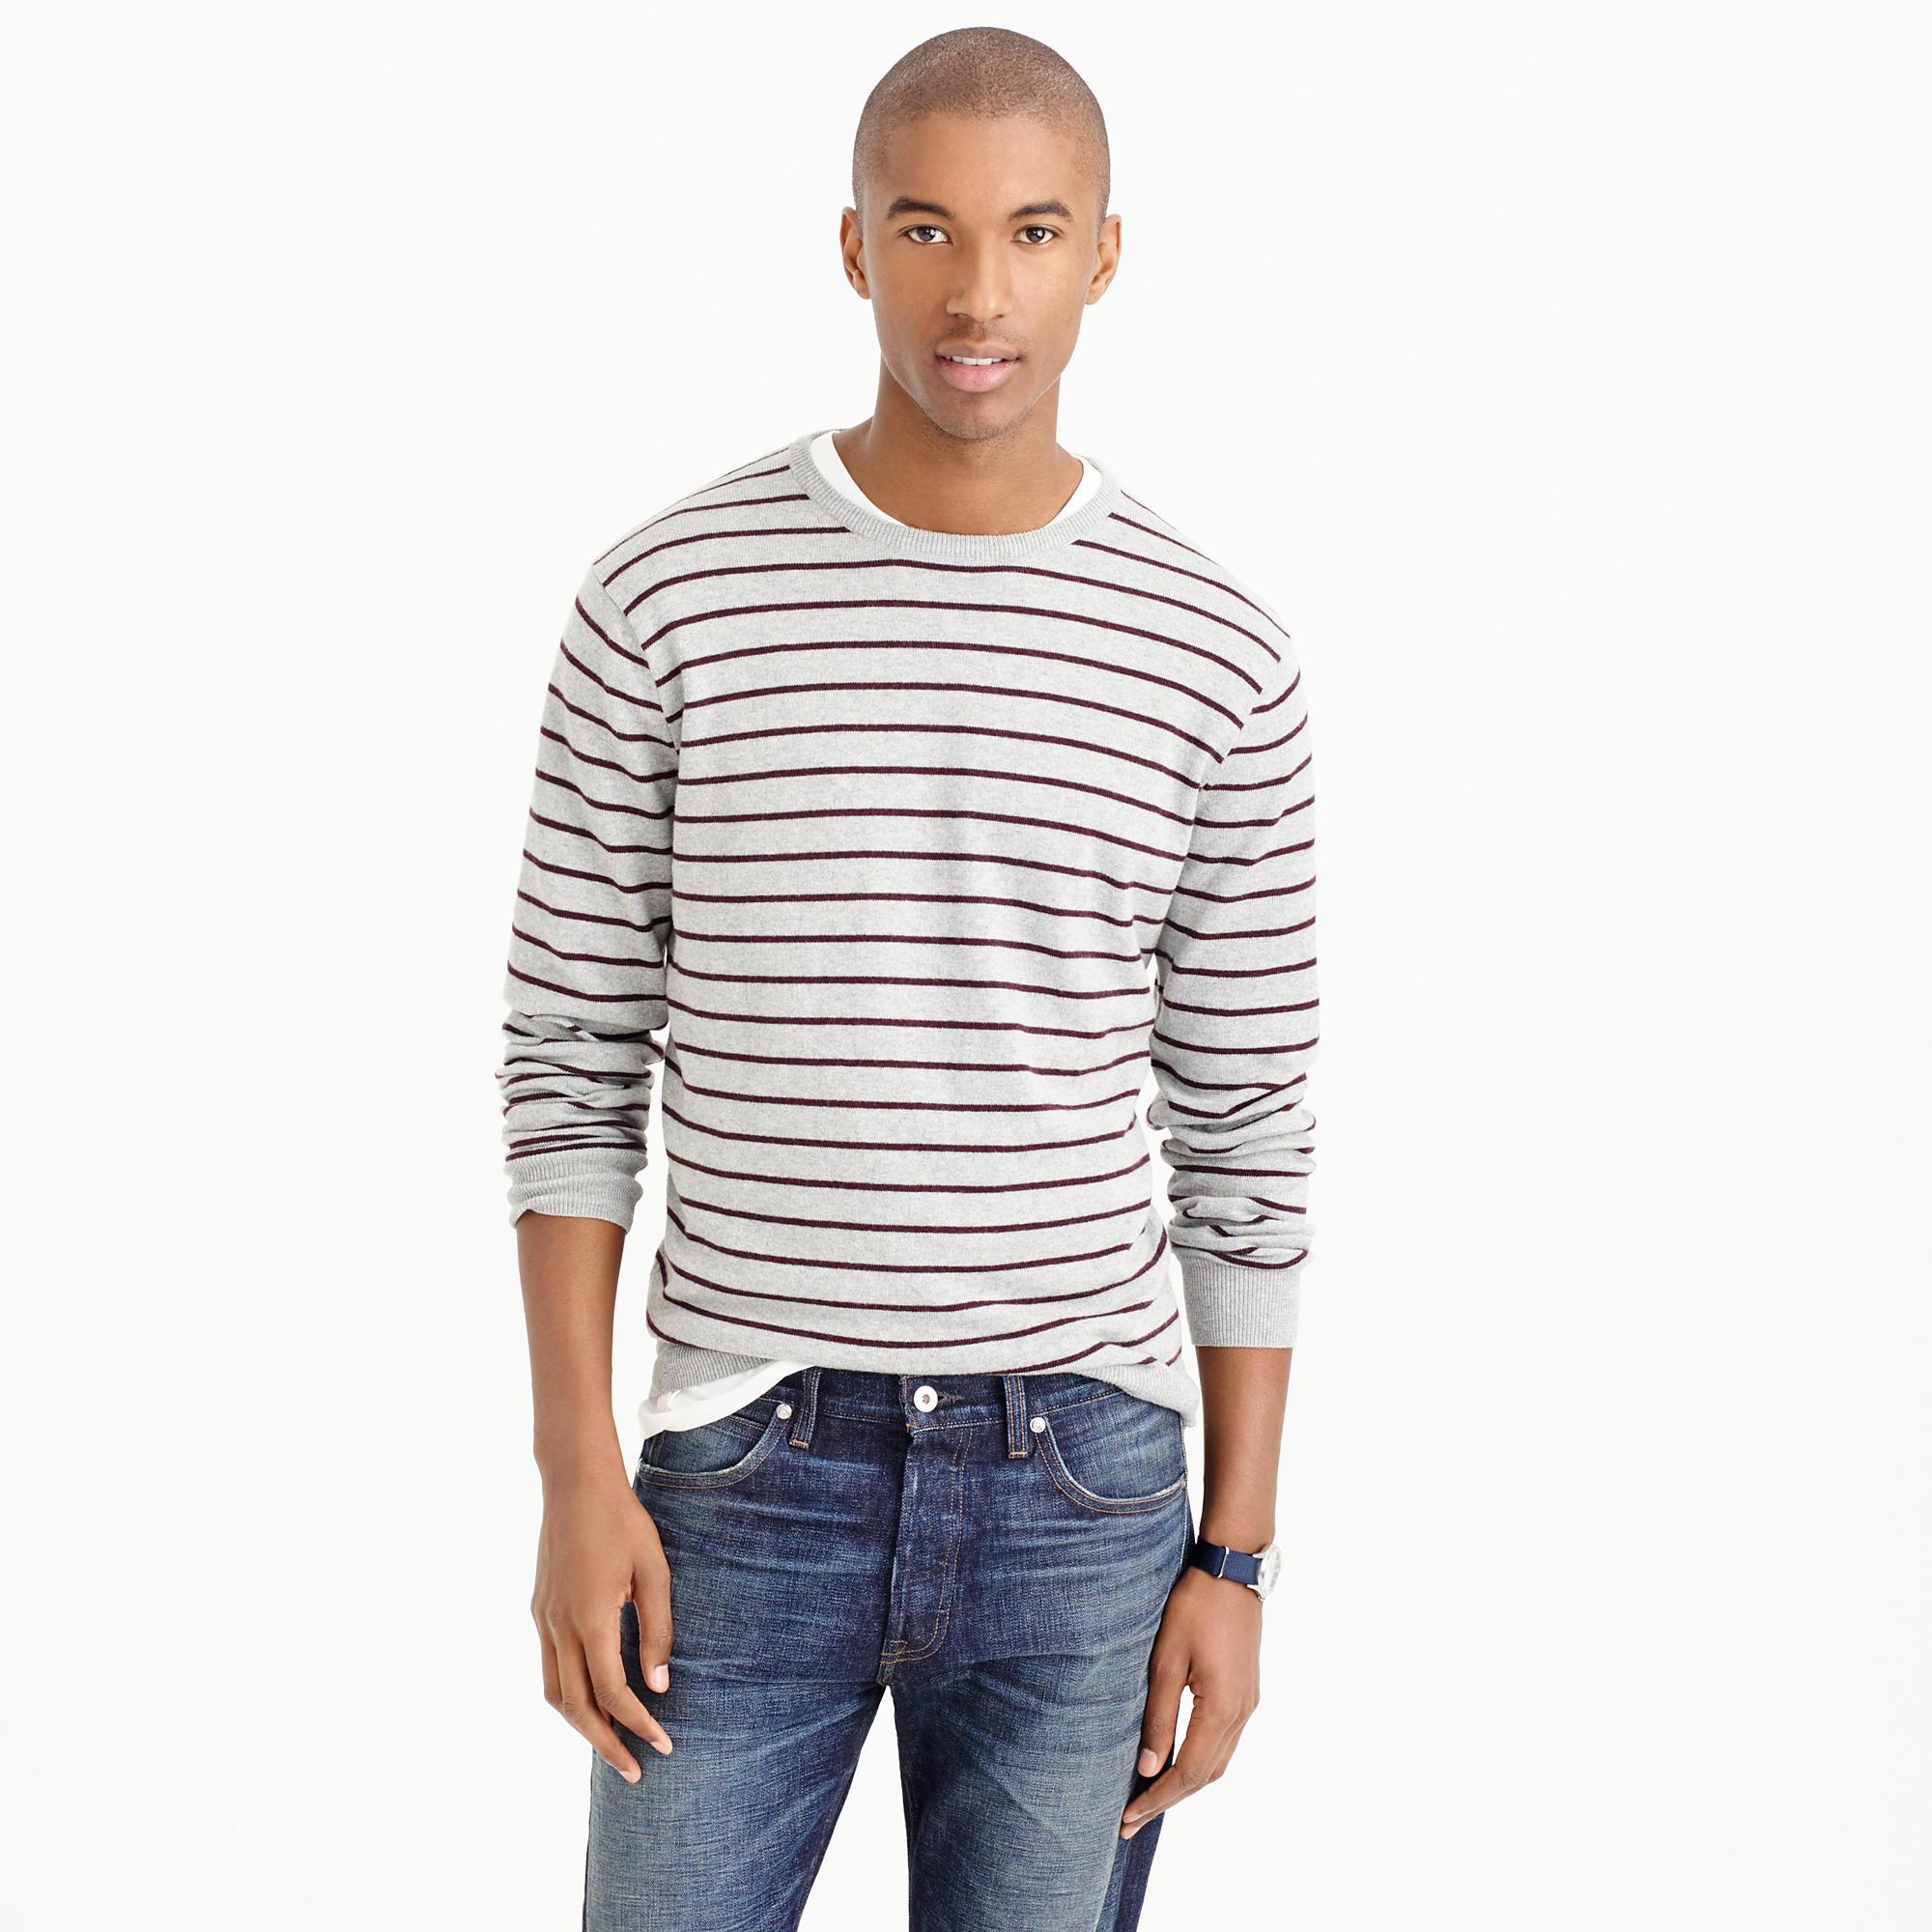 J.crew Cotton-cashmere Sweater In Heather Fine Stripe in Natural ...